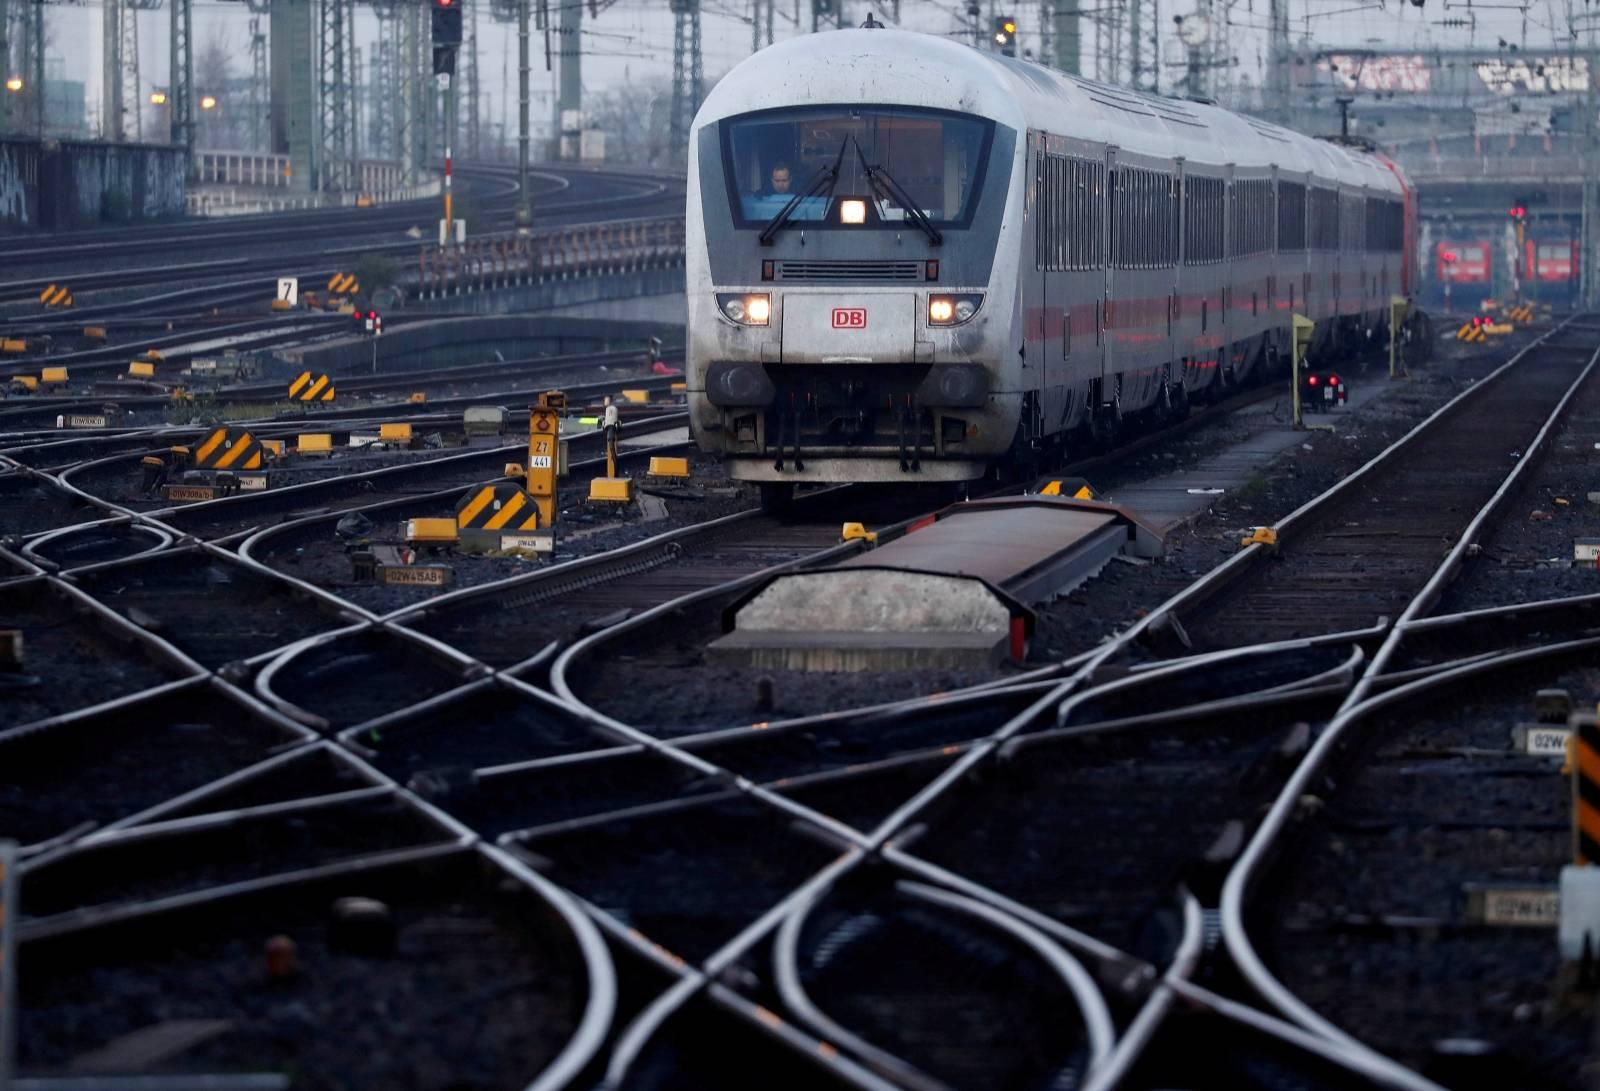 FILE PHOTO: A locomotive engine of German railway Deutsche Bahn is seen at the main train station in Frankfurt